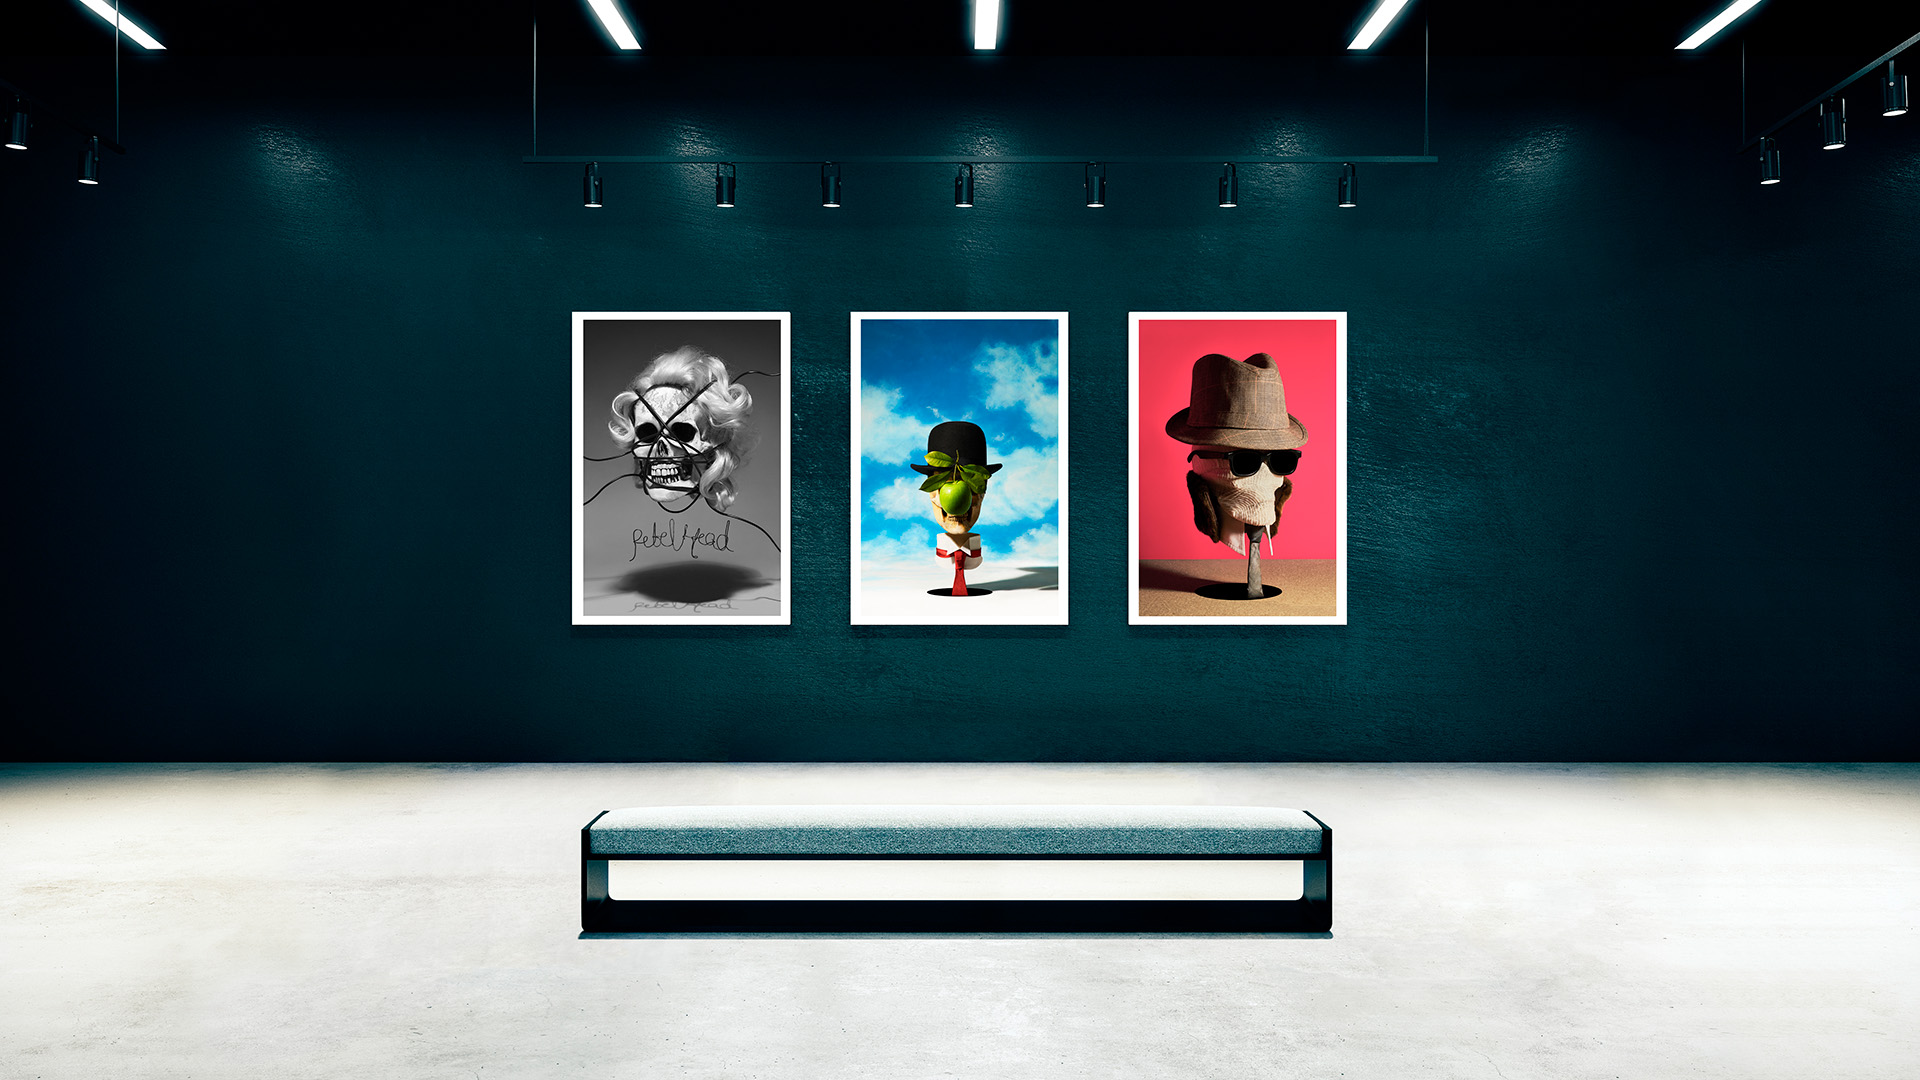 Exposicion-Sintora-Memento-mori-rebel-head-magritte-hombre-invisible-Horno-Art-Virtual-Gallery-madonna-galeria-arte-fotografia-artistica-decorativa